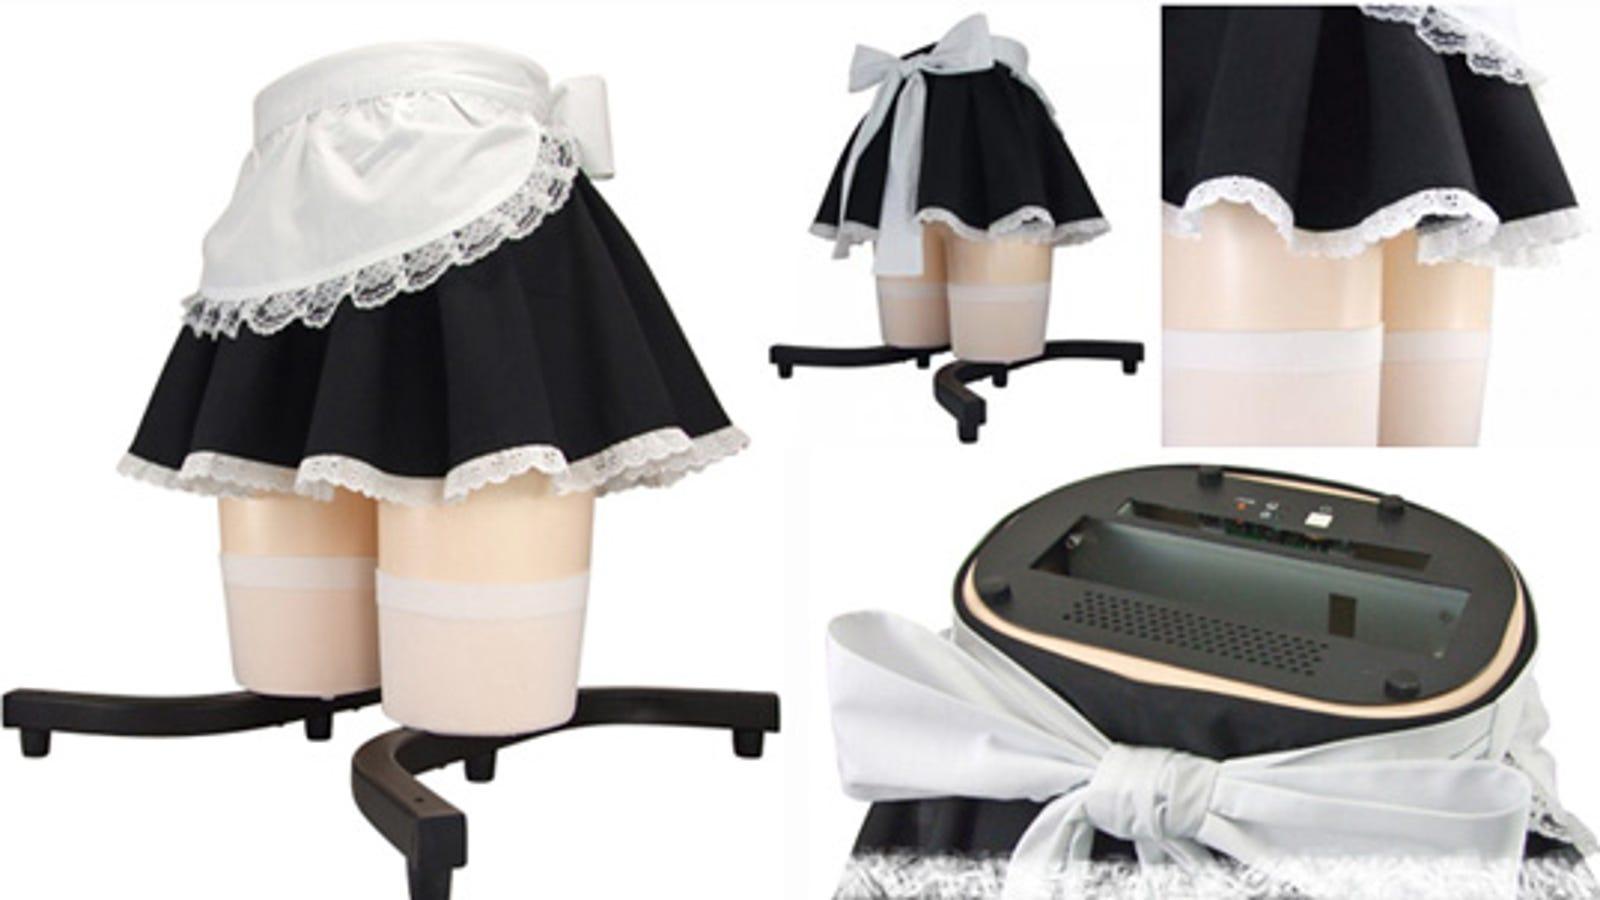 French Maid Skirt Pc Case Is Otaku Heaven